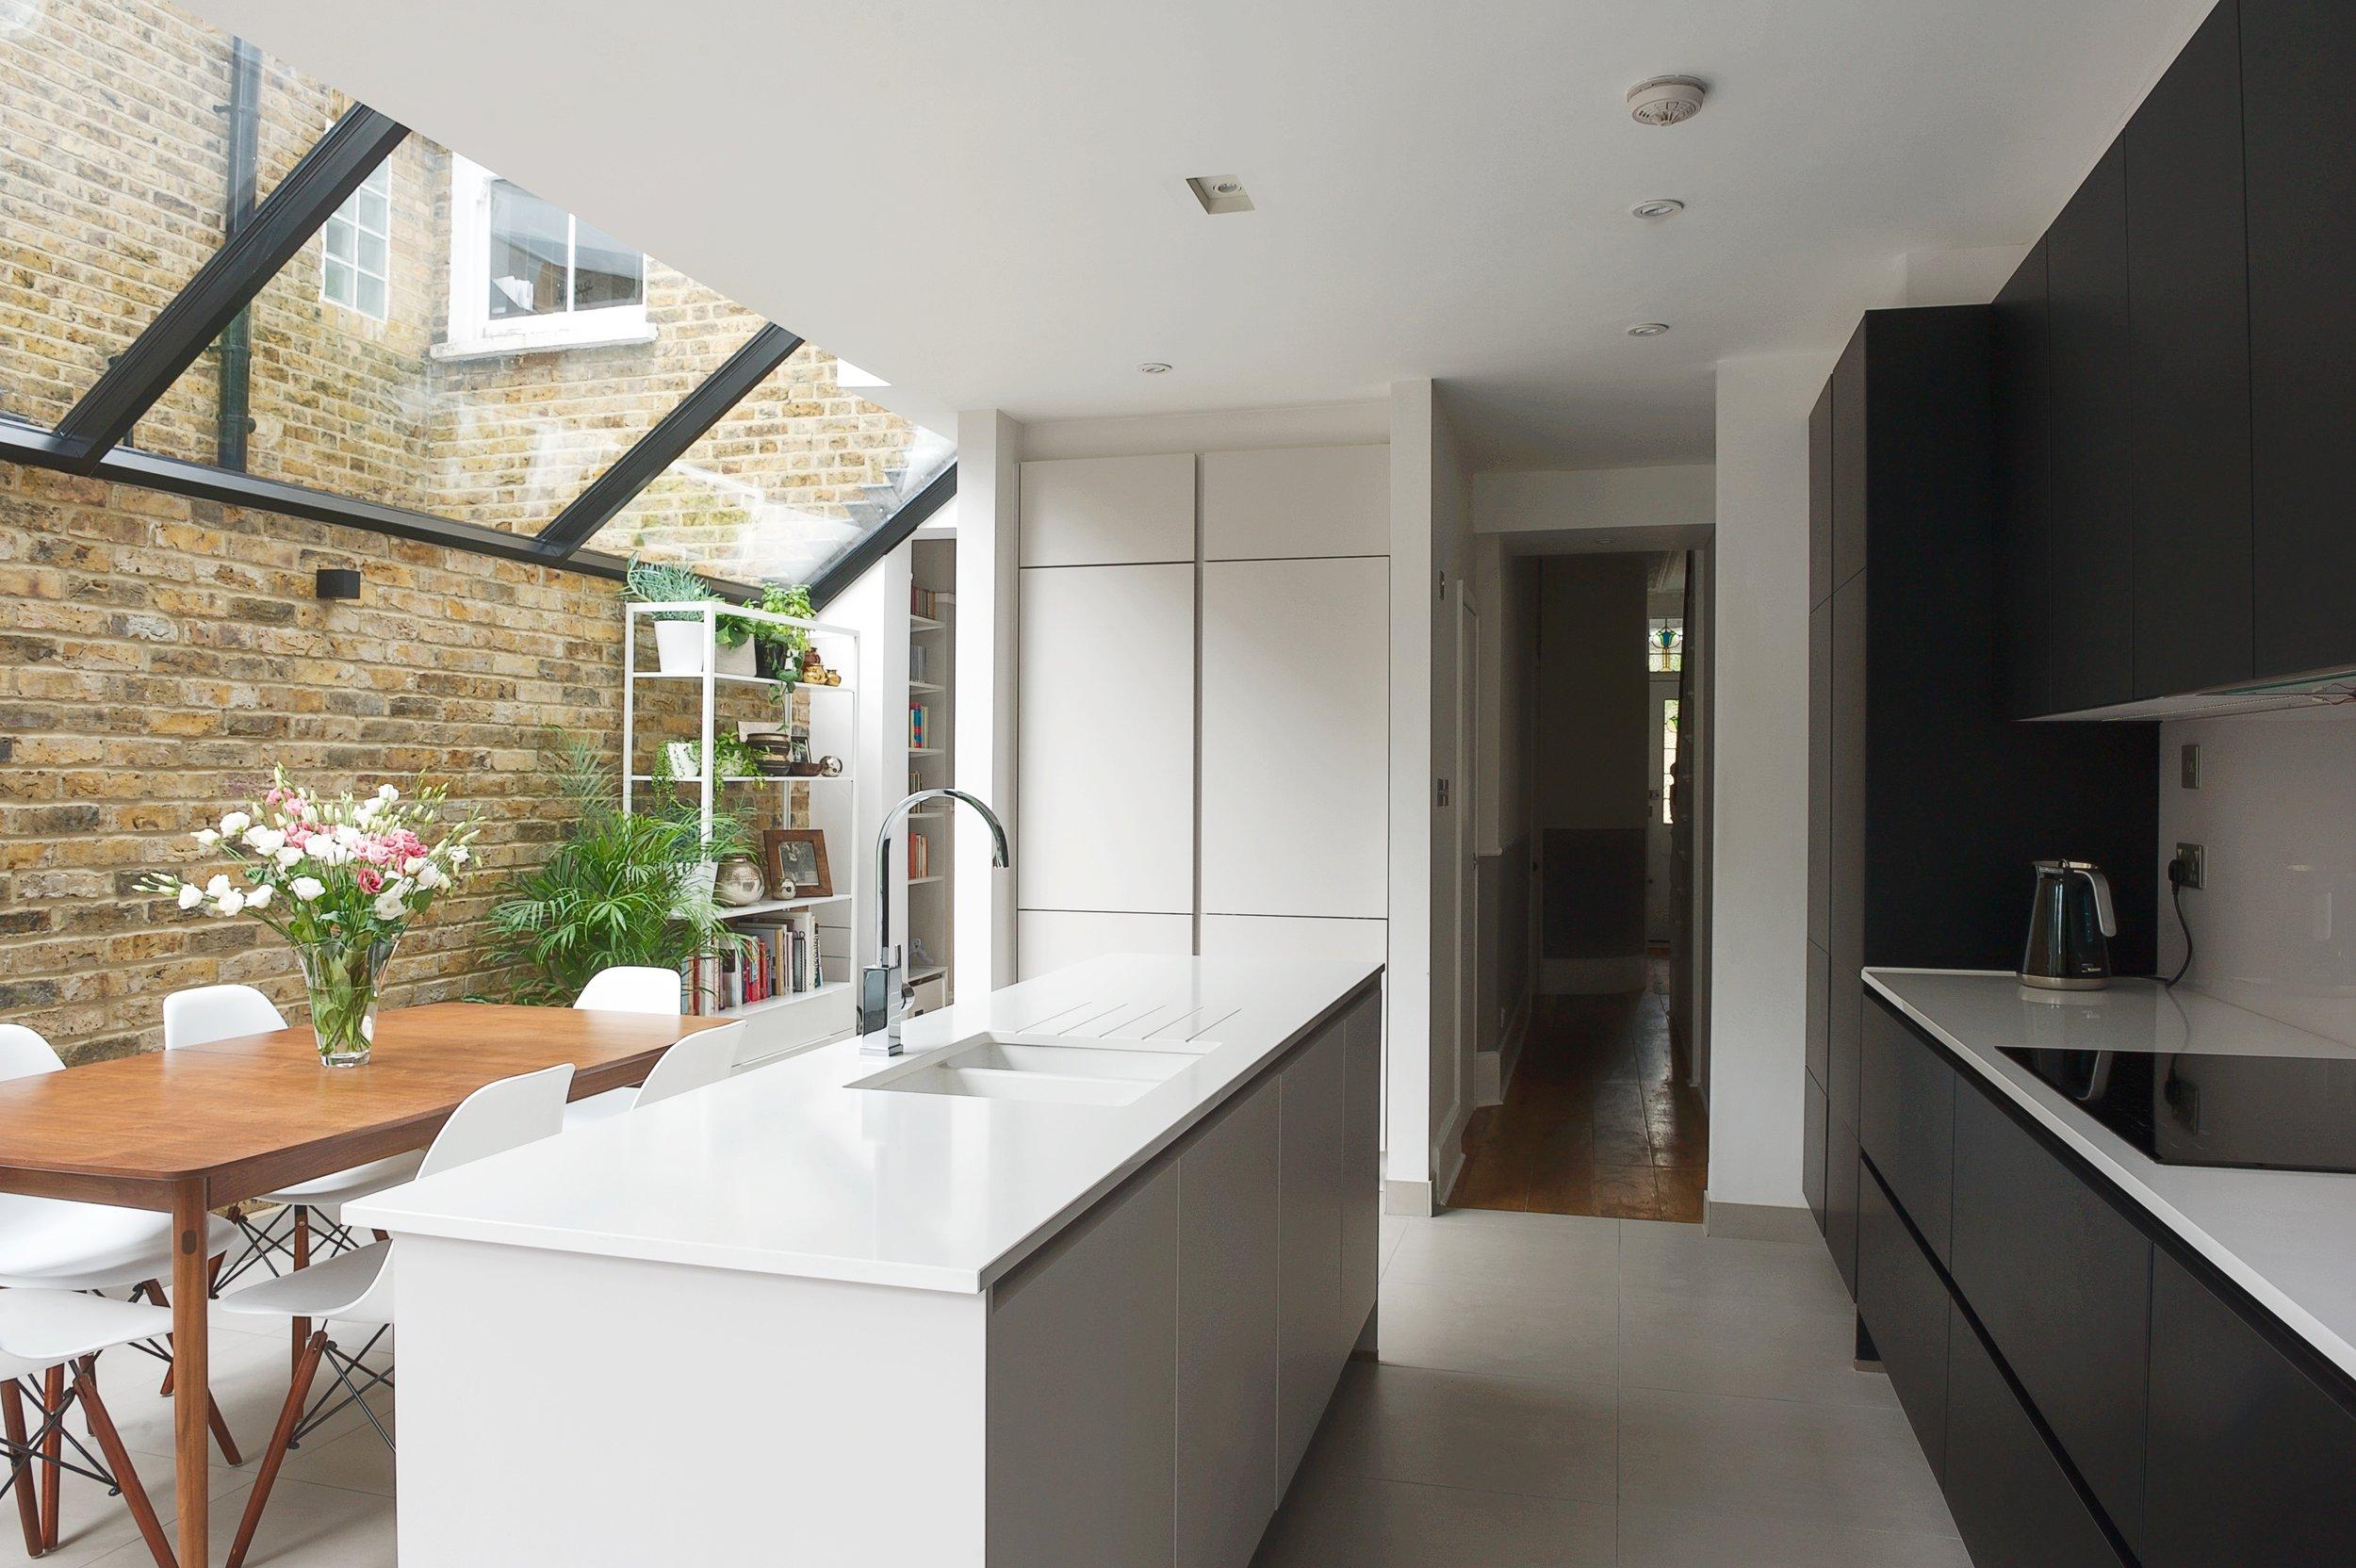 swallowfield-road-kitchen-3.jpg